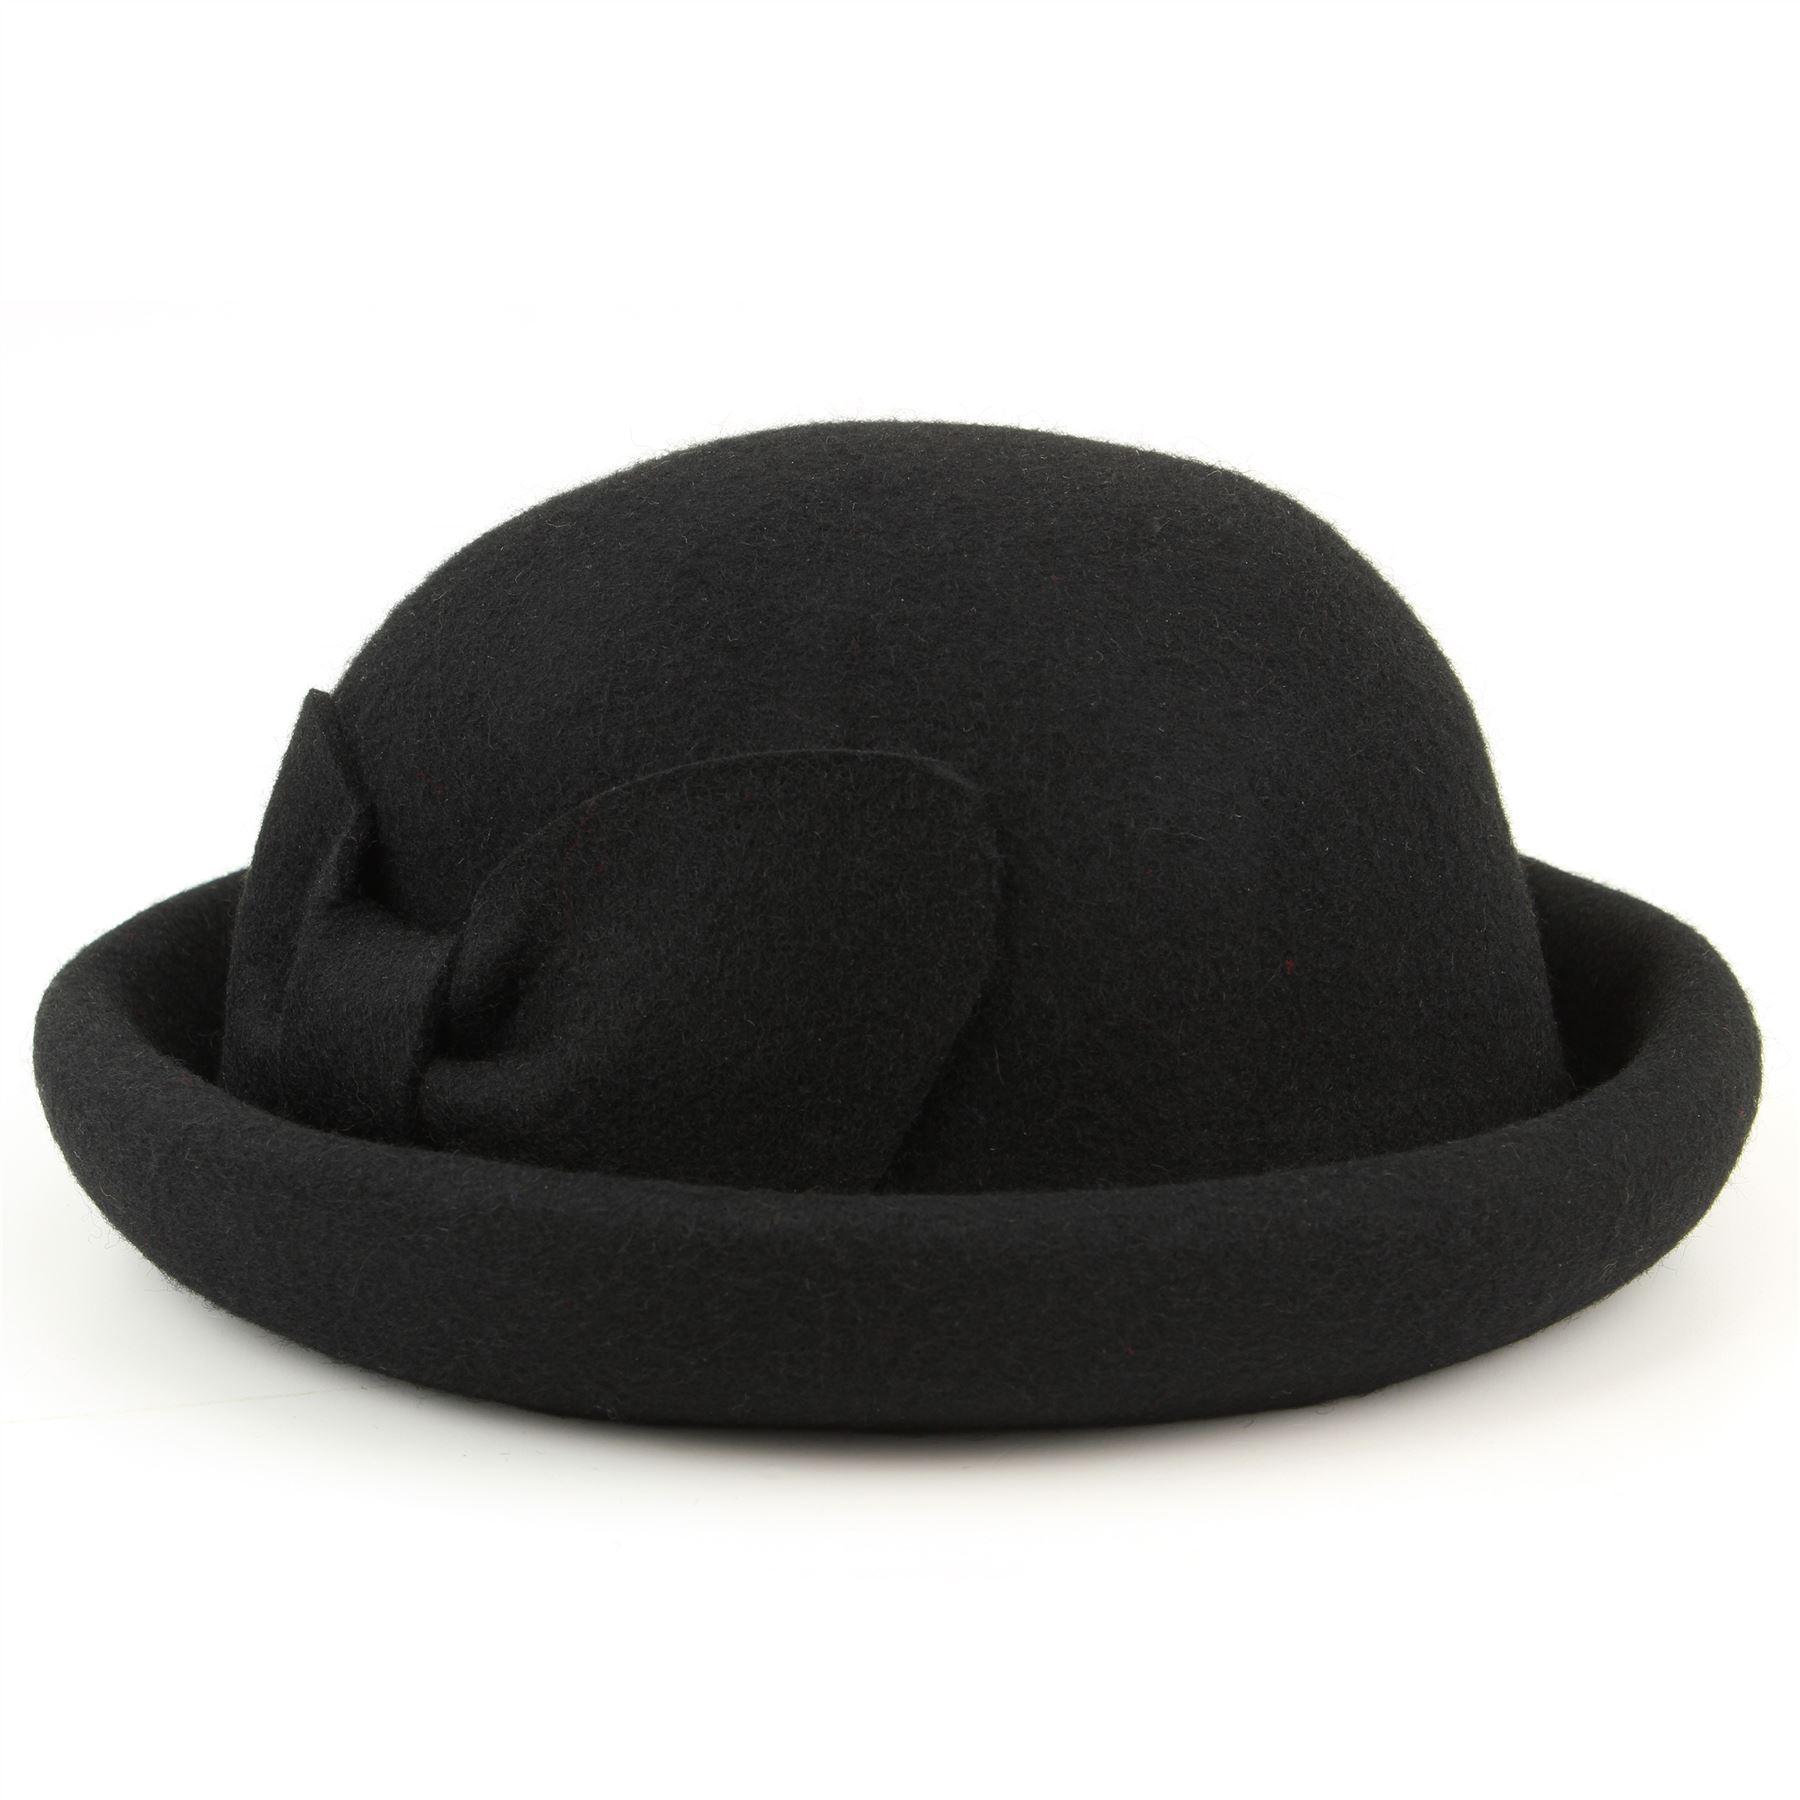 black bowler hat derby rolled brim womens mens